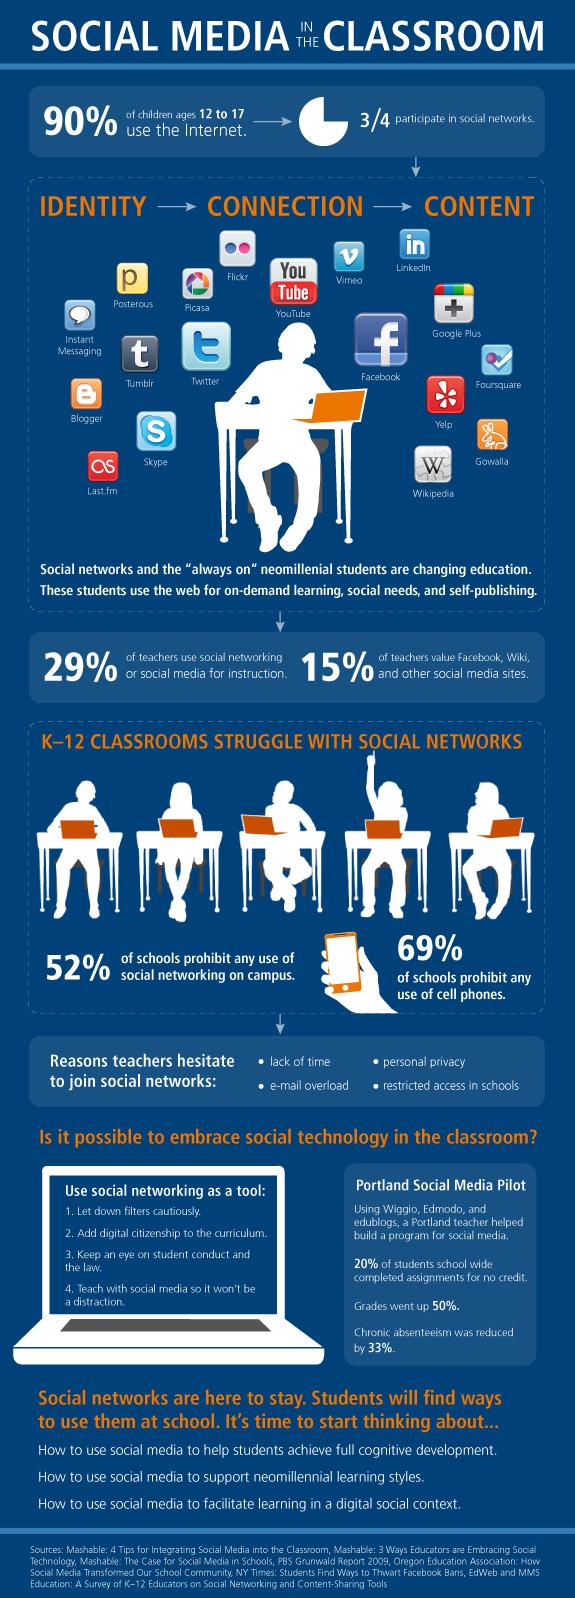 ole_social_media_classroom